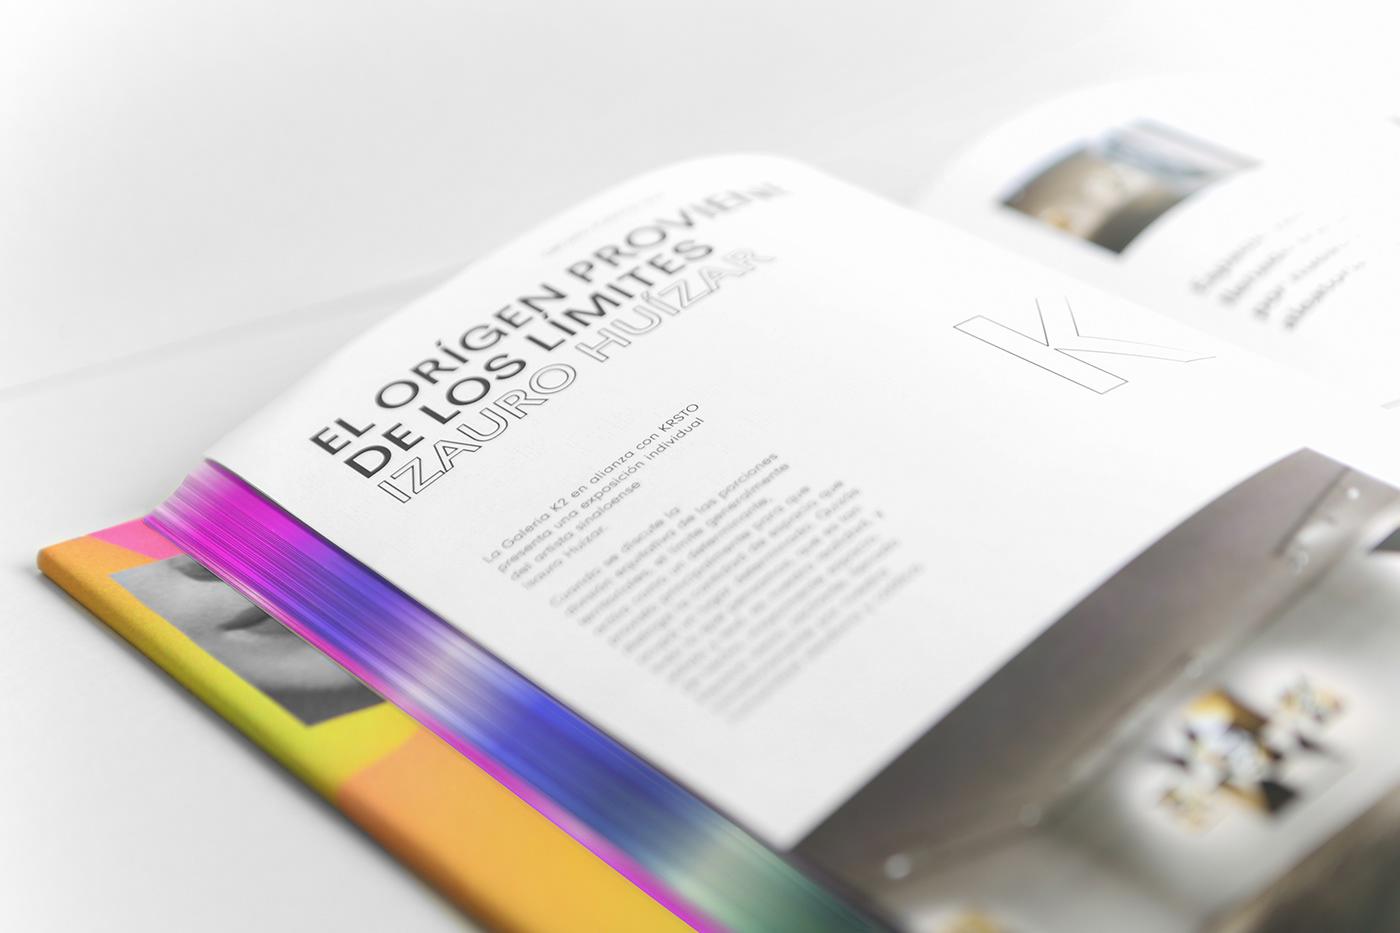 design monterrey graphic gradients art editorial type motiongraphics logo digital